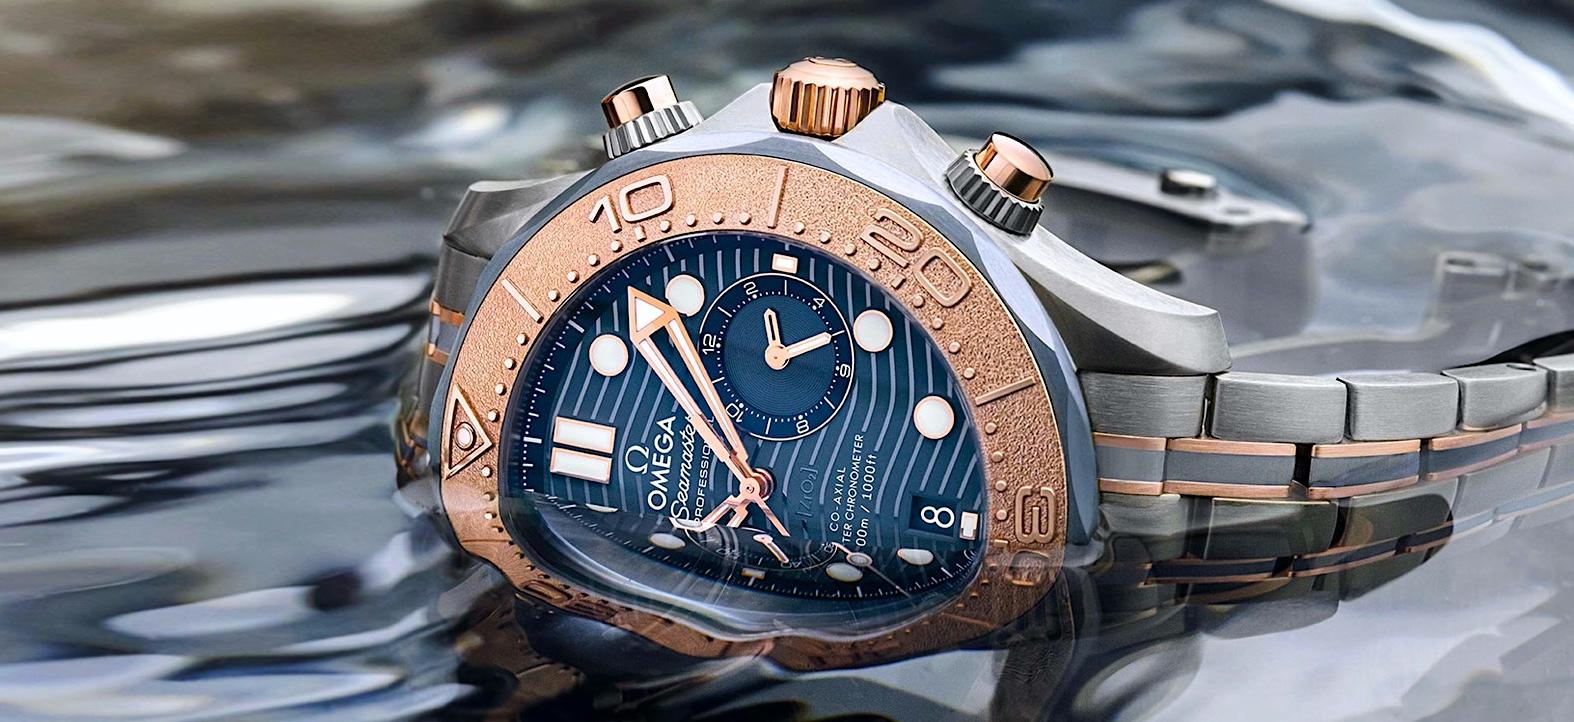 Omega Seamaster Diver 300M Chronograph - cover